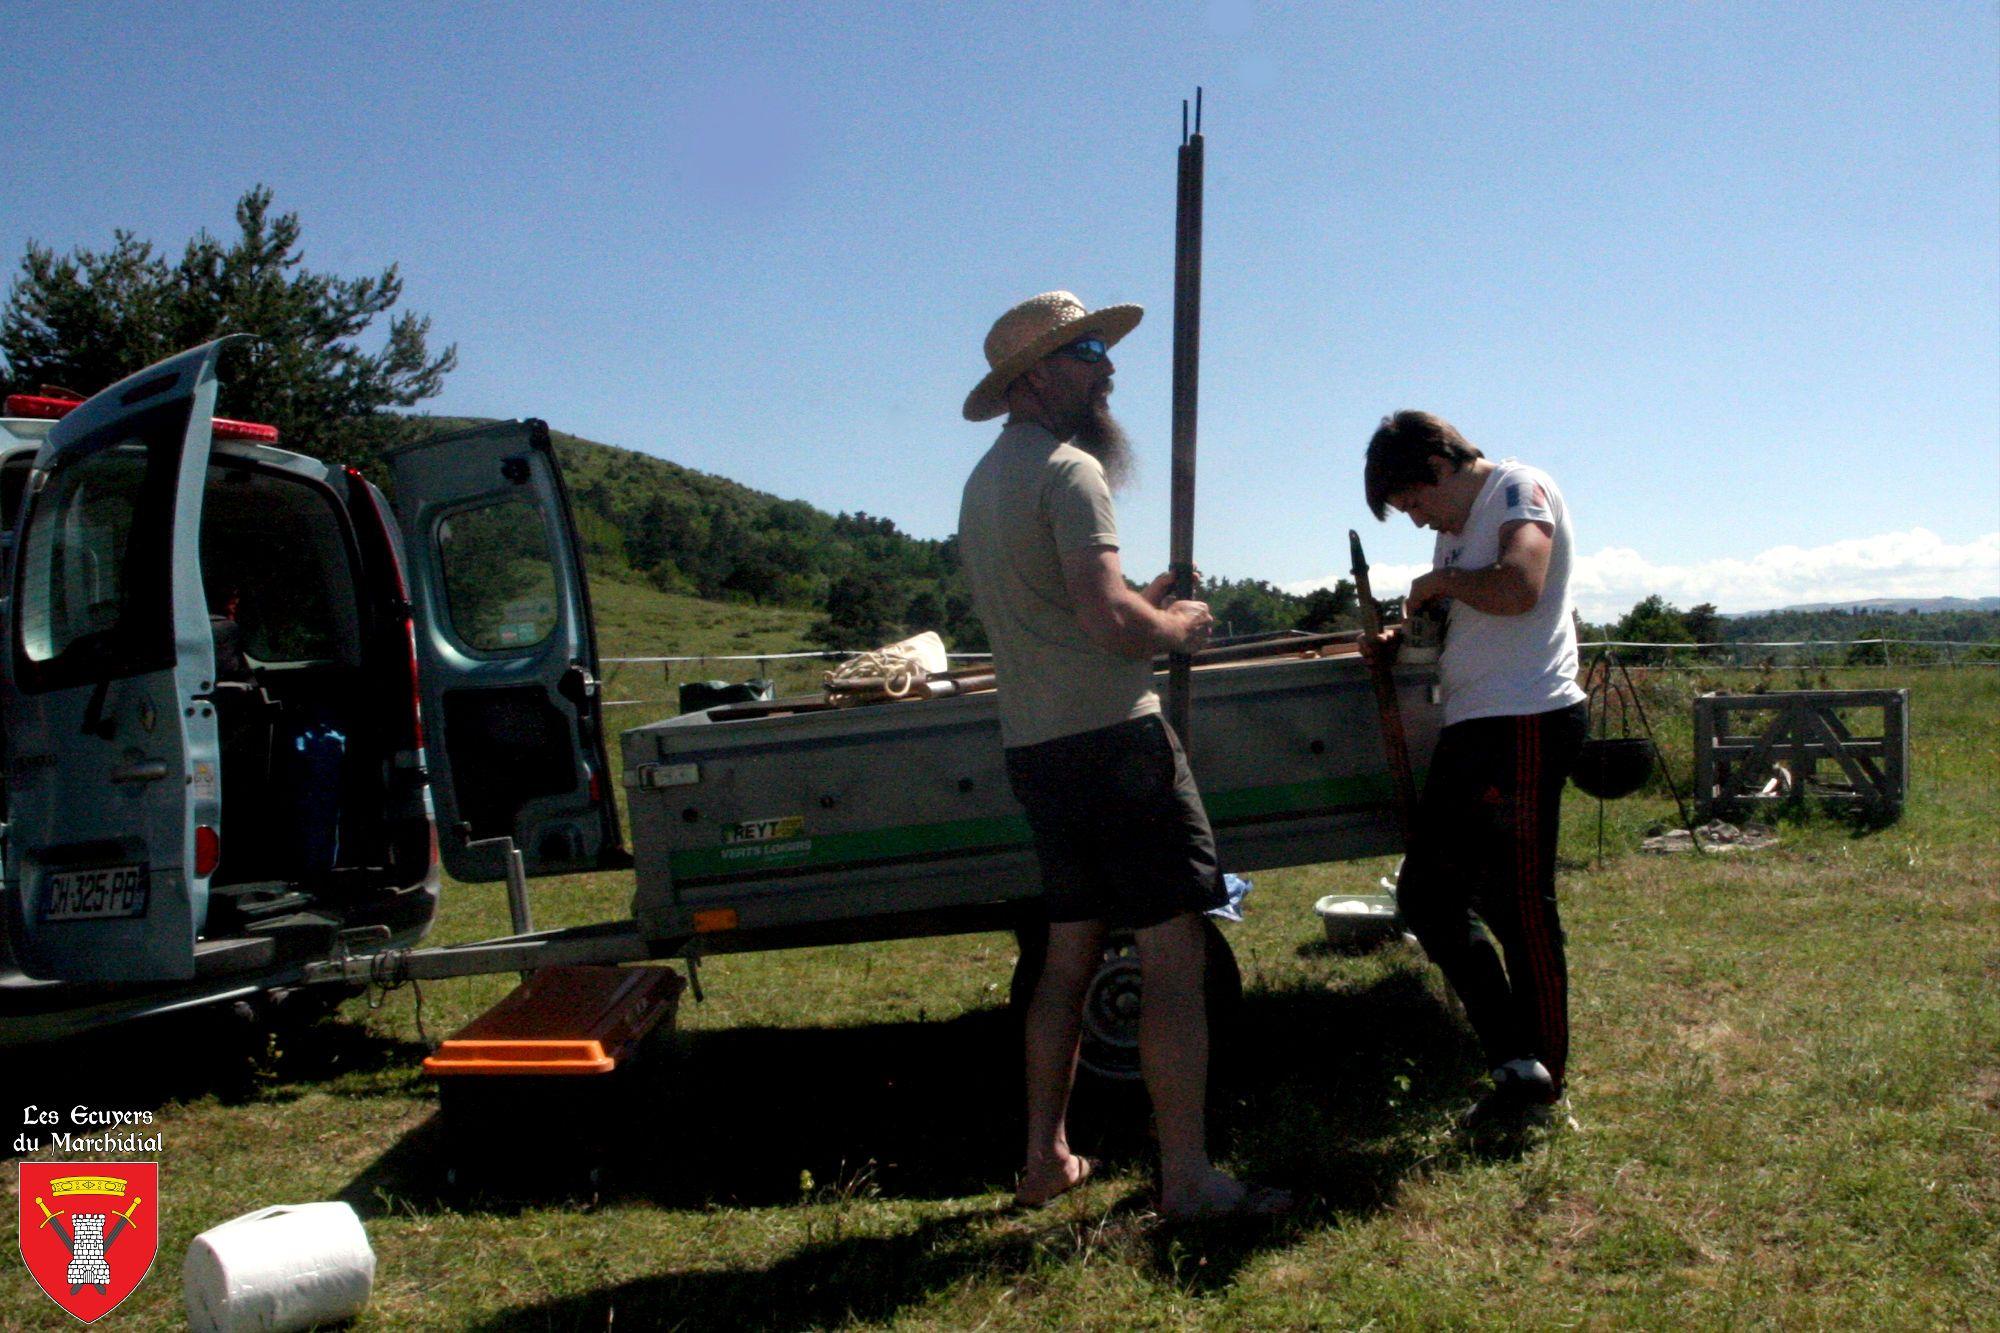 2020-06-01_Camping_Gourdon-01-www.marchidial.fr_